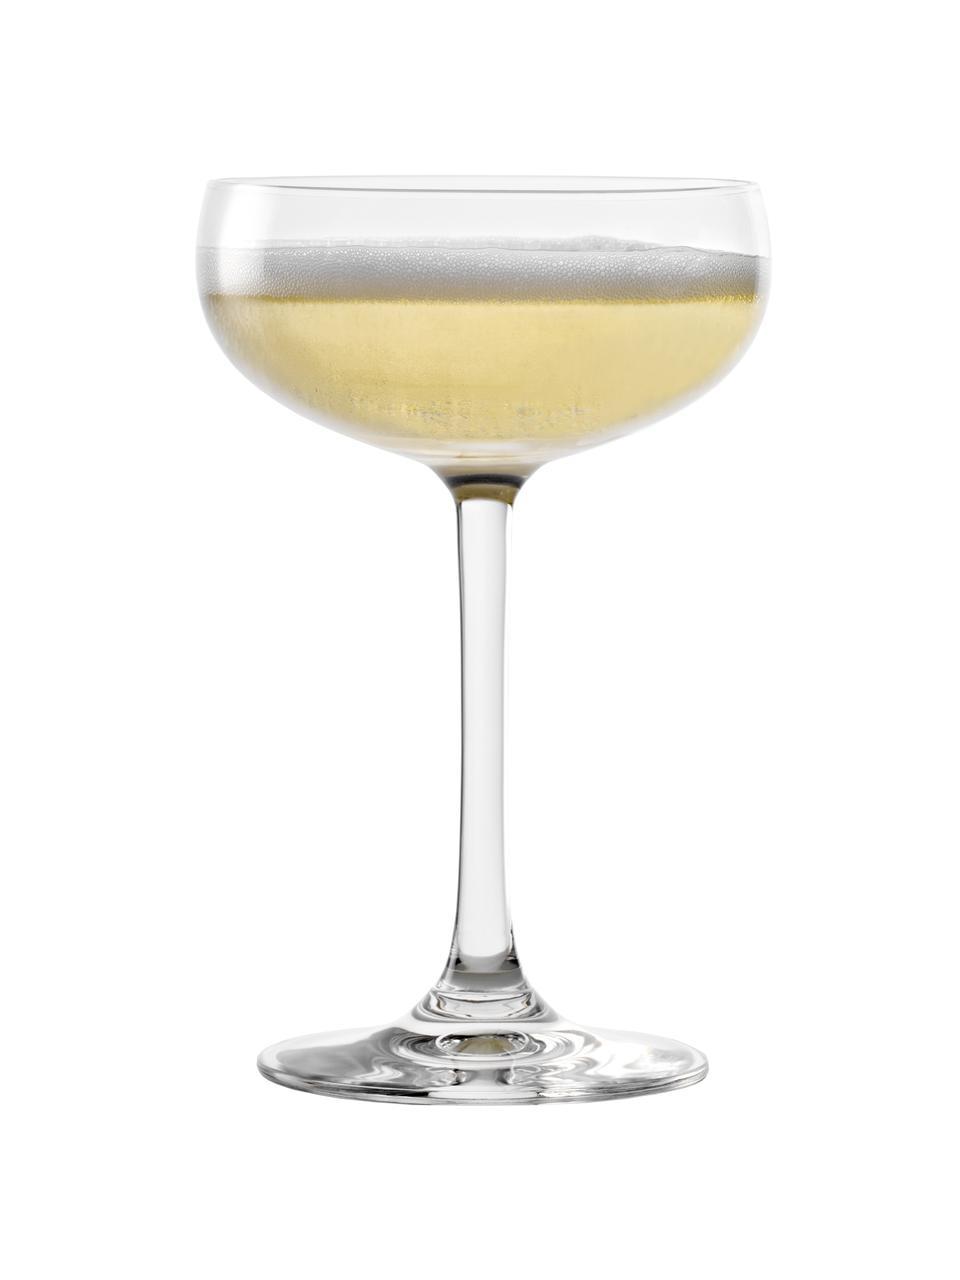 Kryształowy kieliszek do szampana Elements, 6 szt., Szkło kryształowe, Transparentny, Ø 10 x W 15 cm